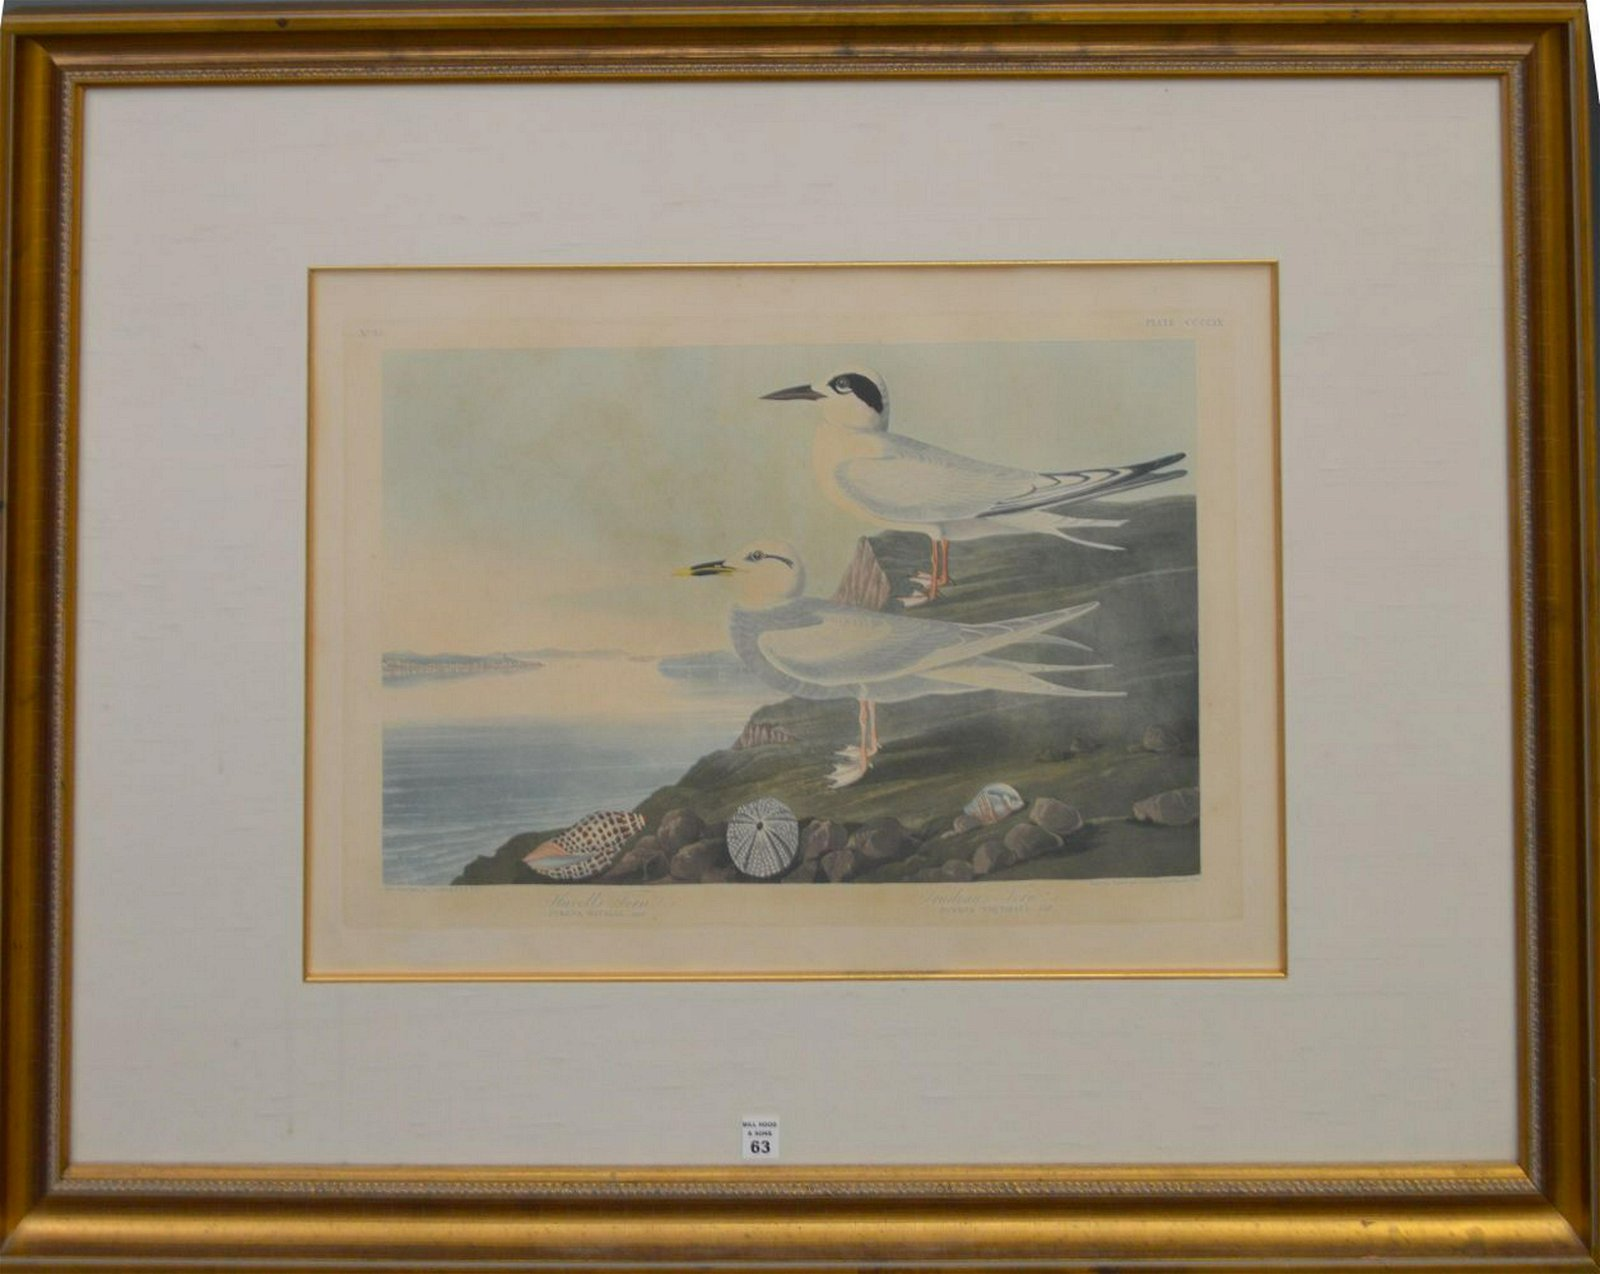 AUDUBON ORIGINAL ENGRAVING  John James Audubon